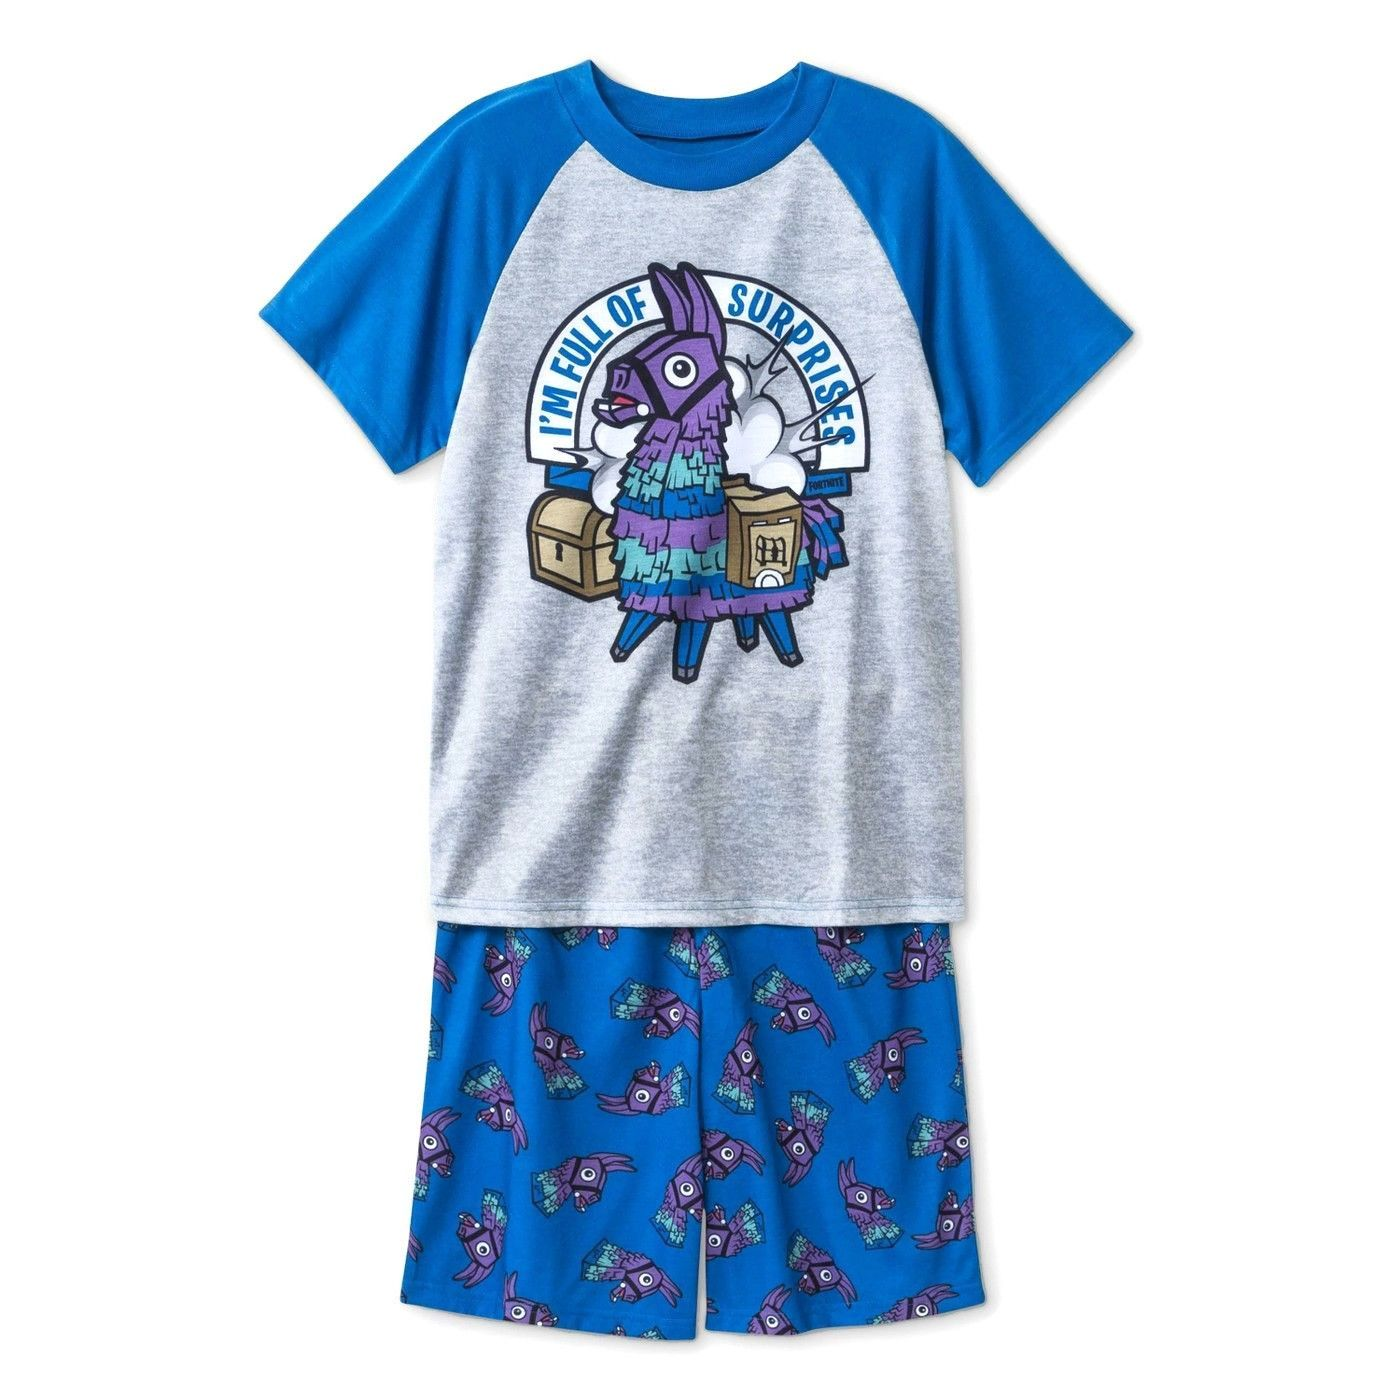 12 Large Boys 3 Piece Set Shirt,Shorts,Pant Loot Llama Fortnite Pajamas Size 10